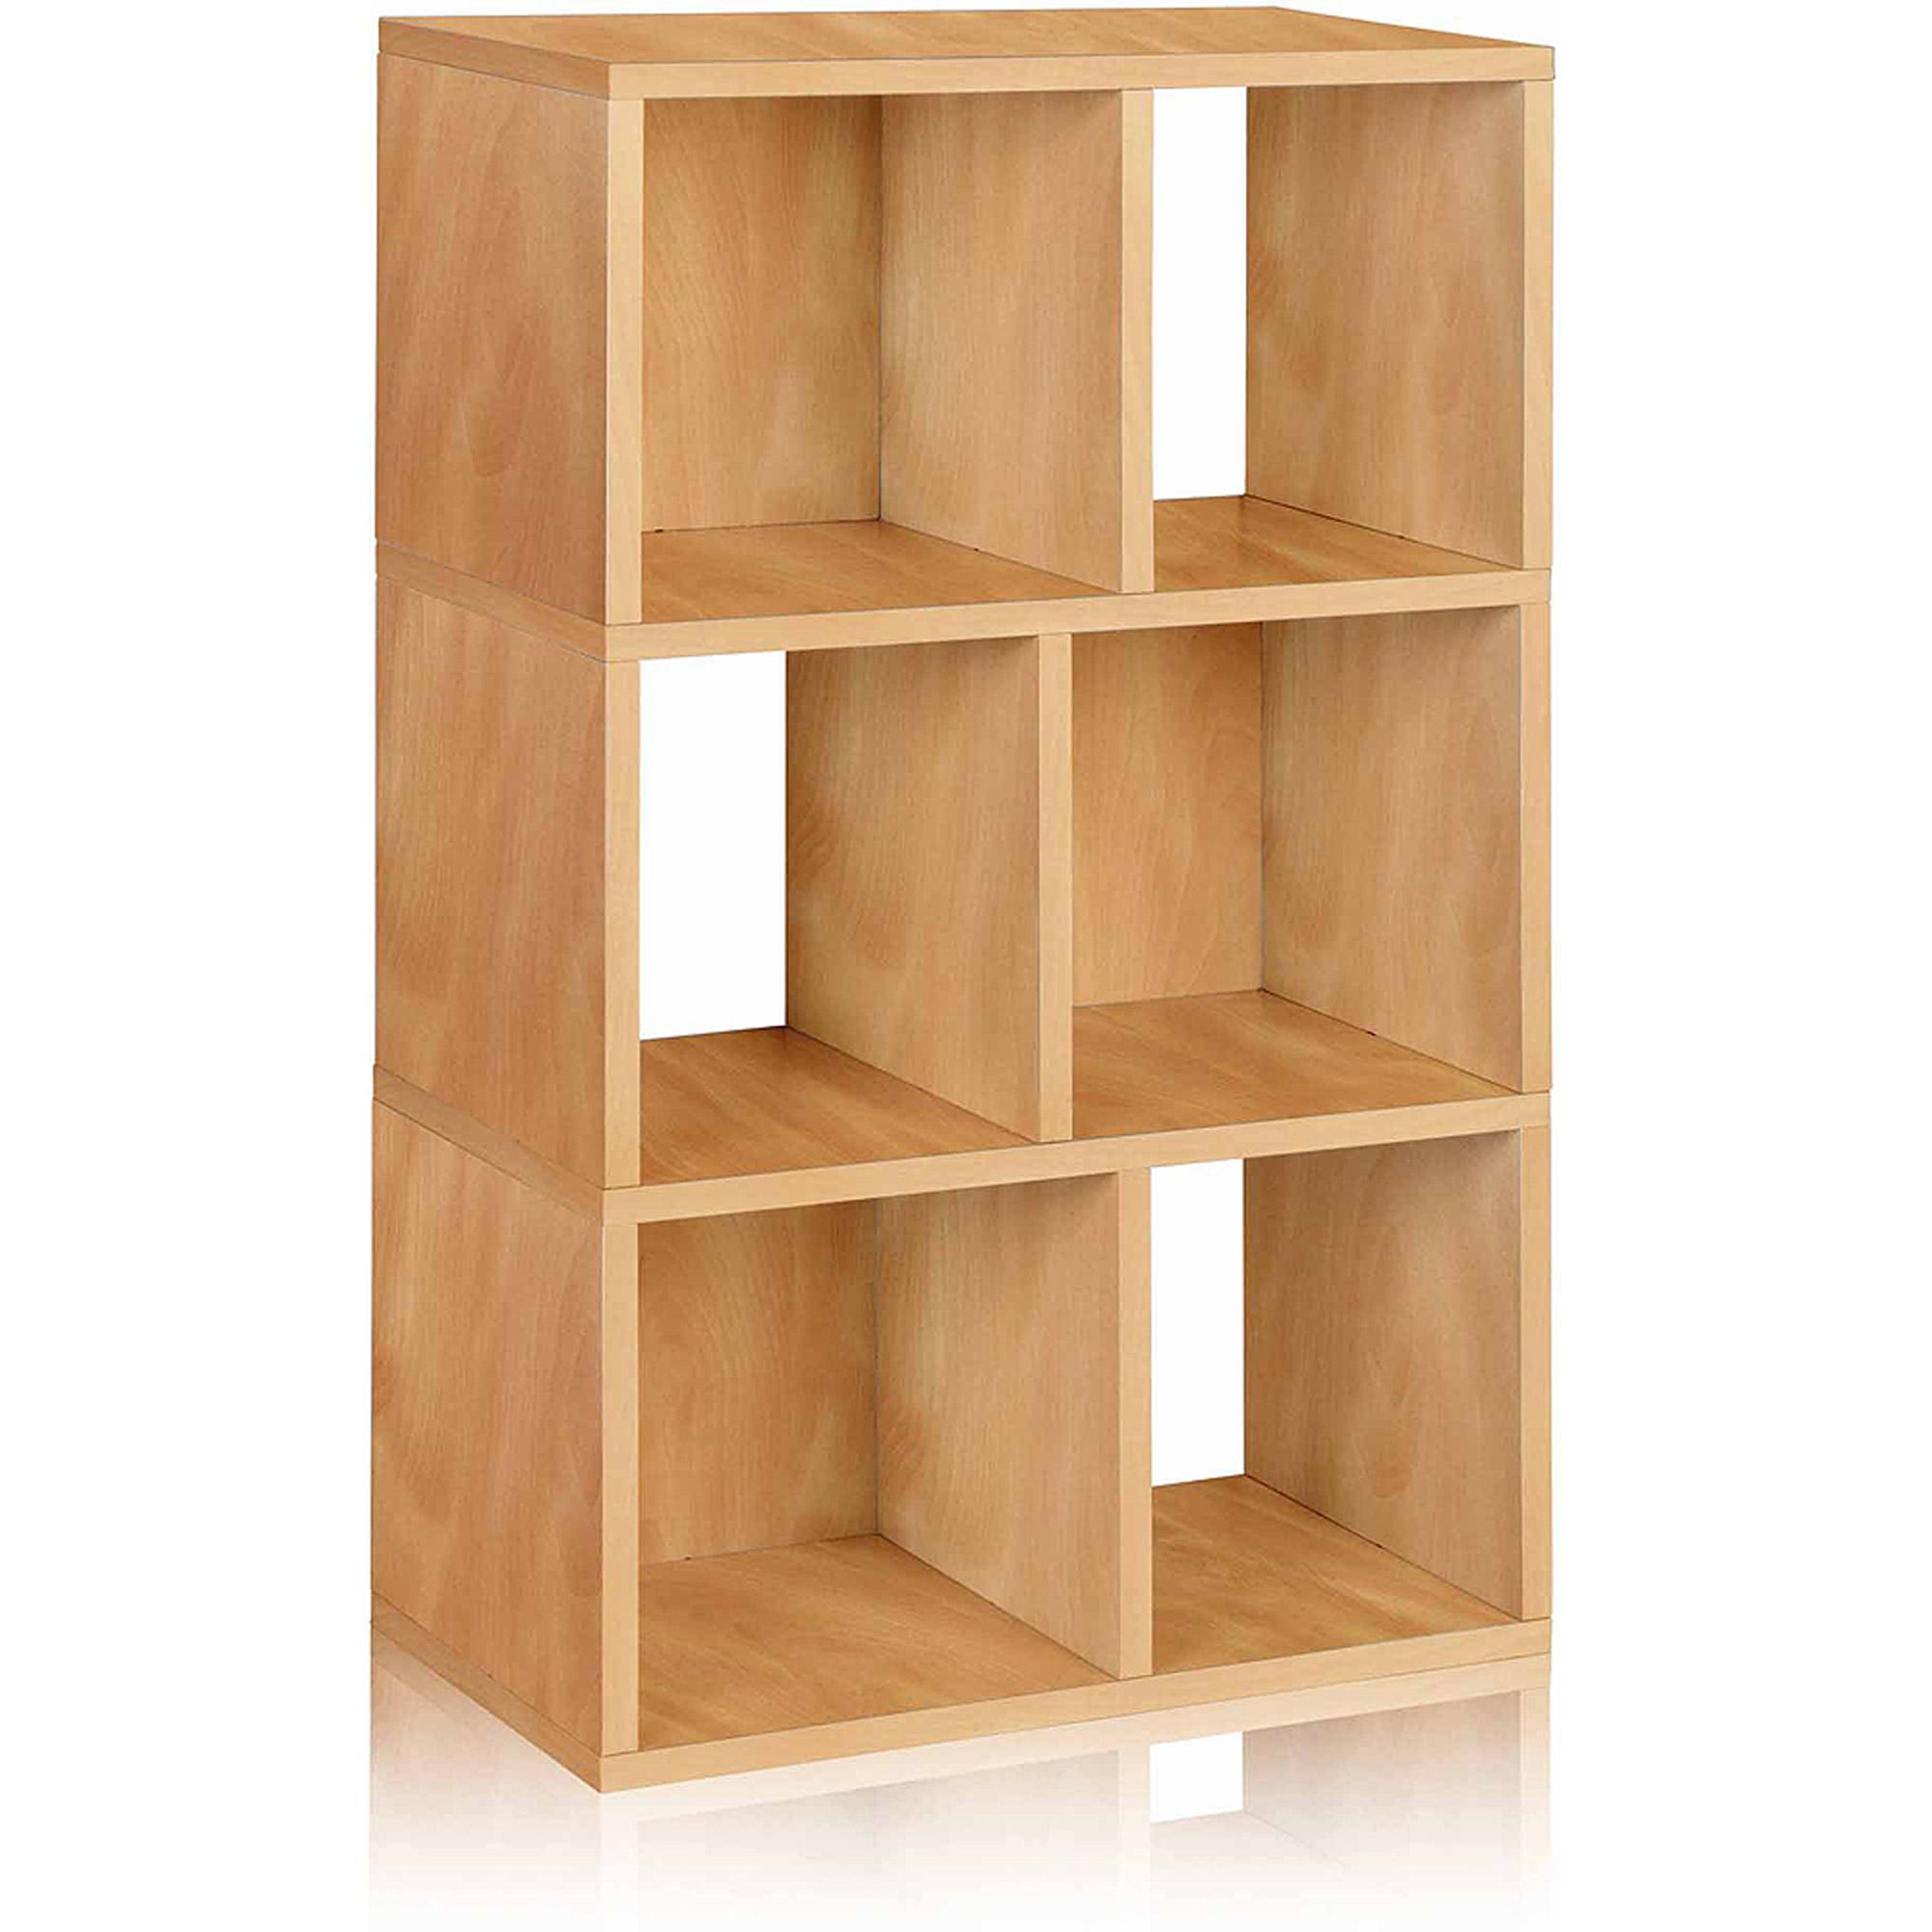 Way Basics Eco 3-Shelf Laguna Bookcase and Cubby Storage, Natural